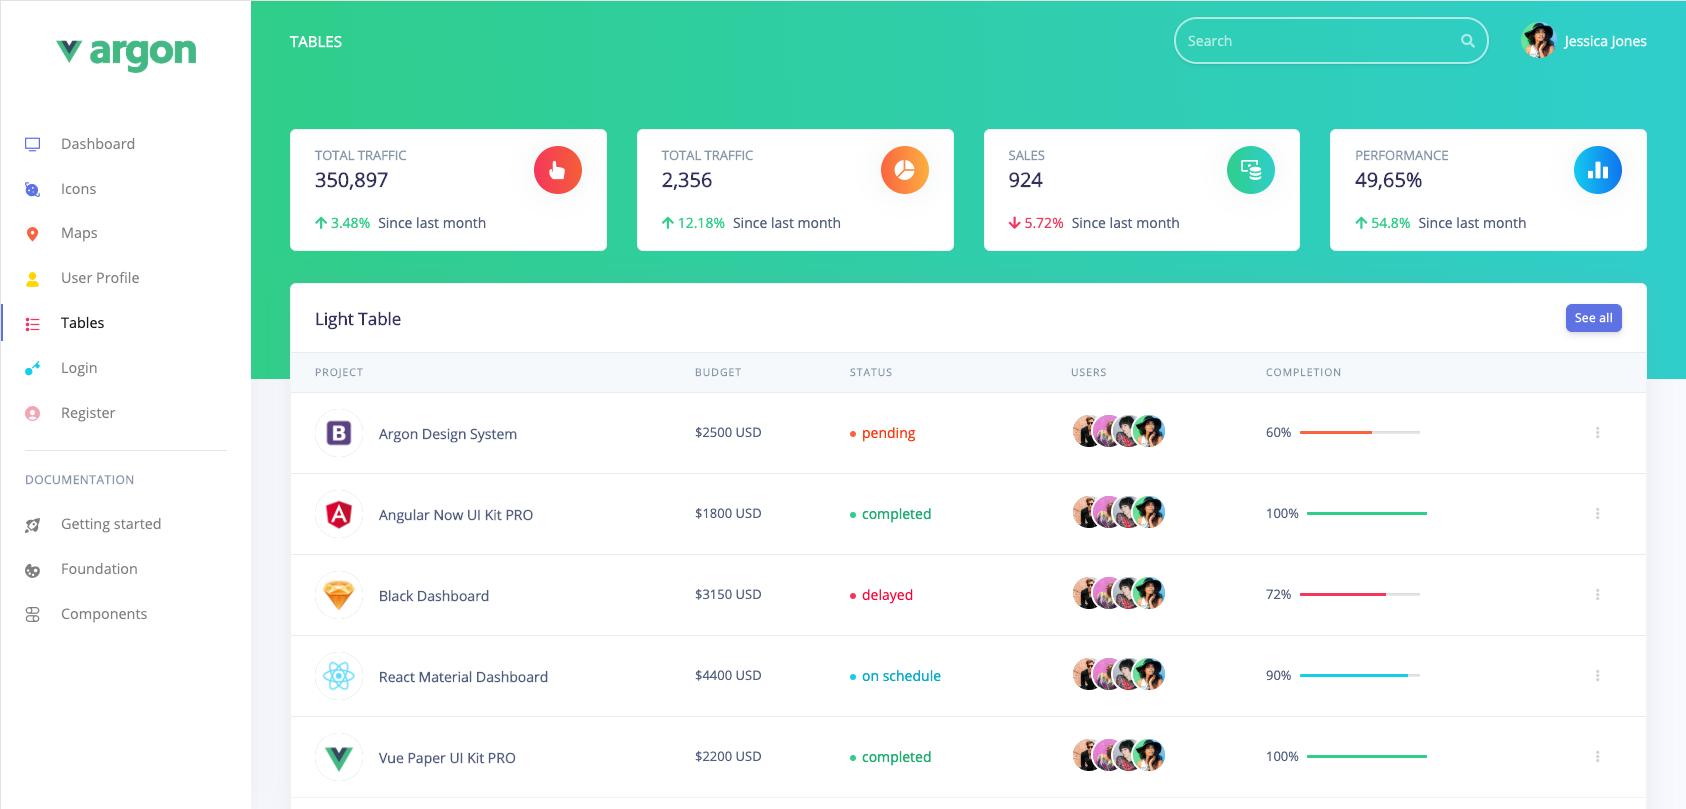 GitHub - creativetimofficial/vue-argon-dashboard: Vue Argon Dashboard